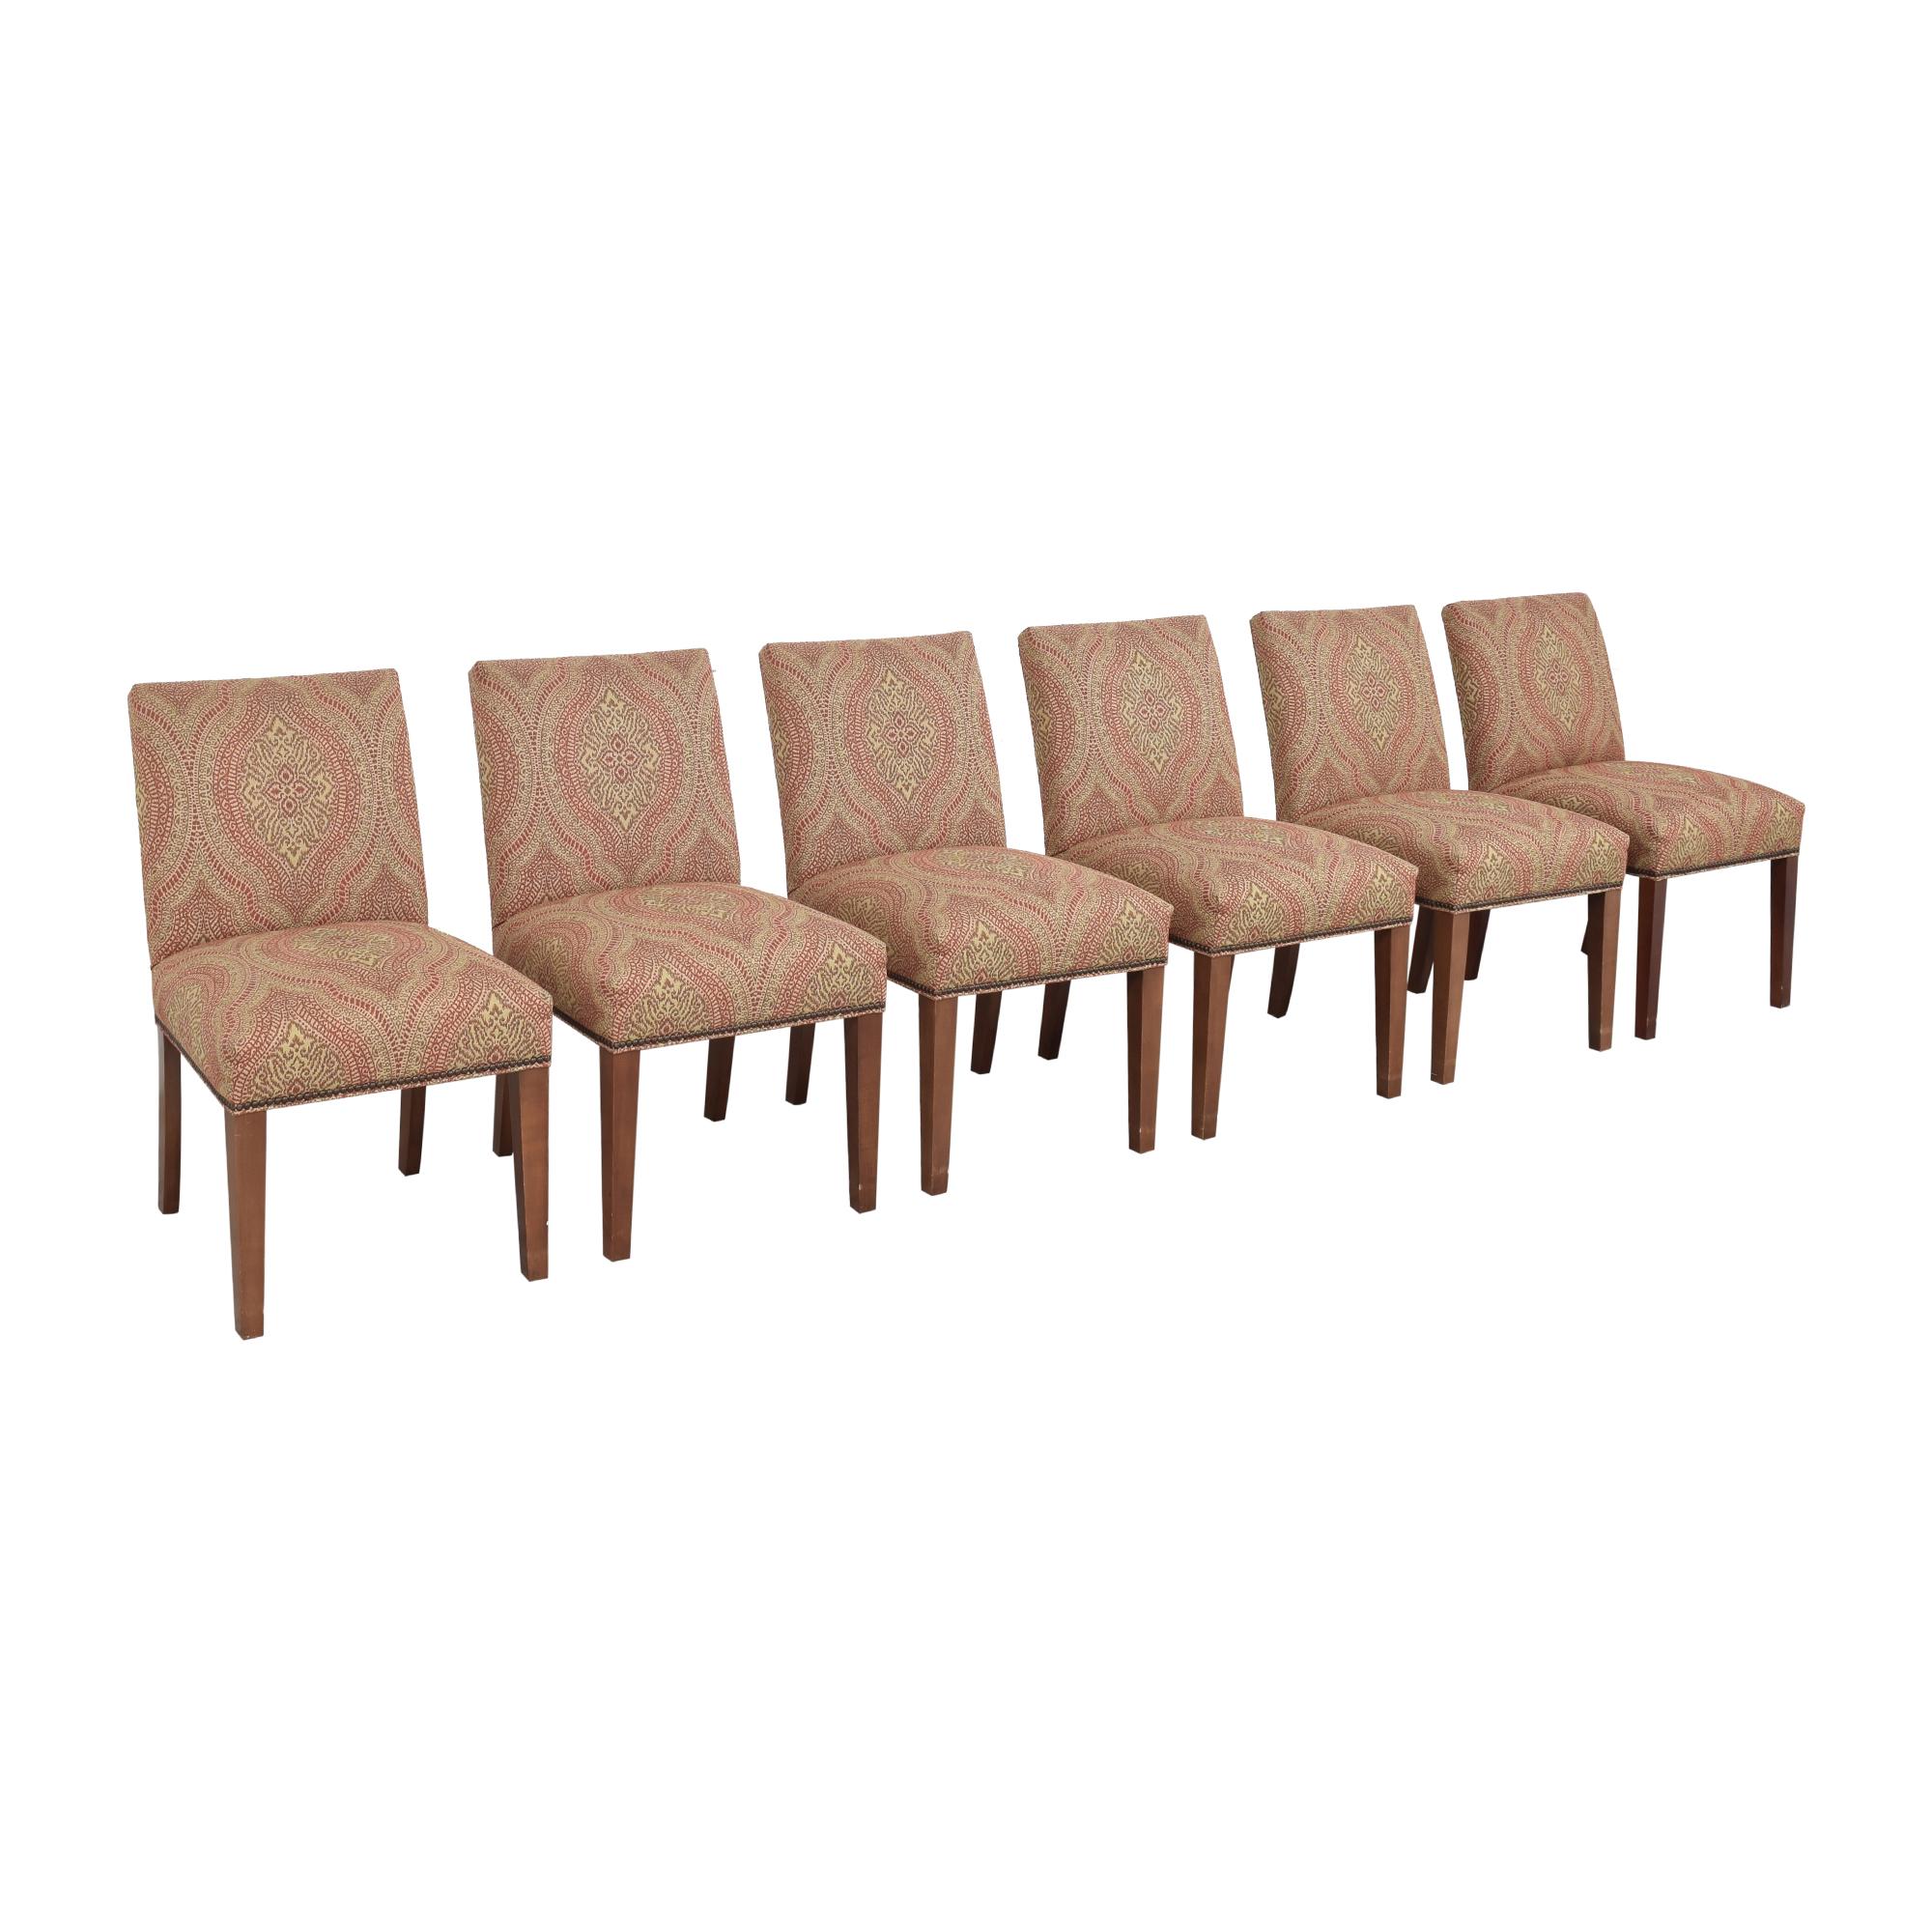 Ethan Allen Ethan Allen Sebago Dining Chairs price